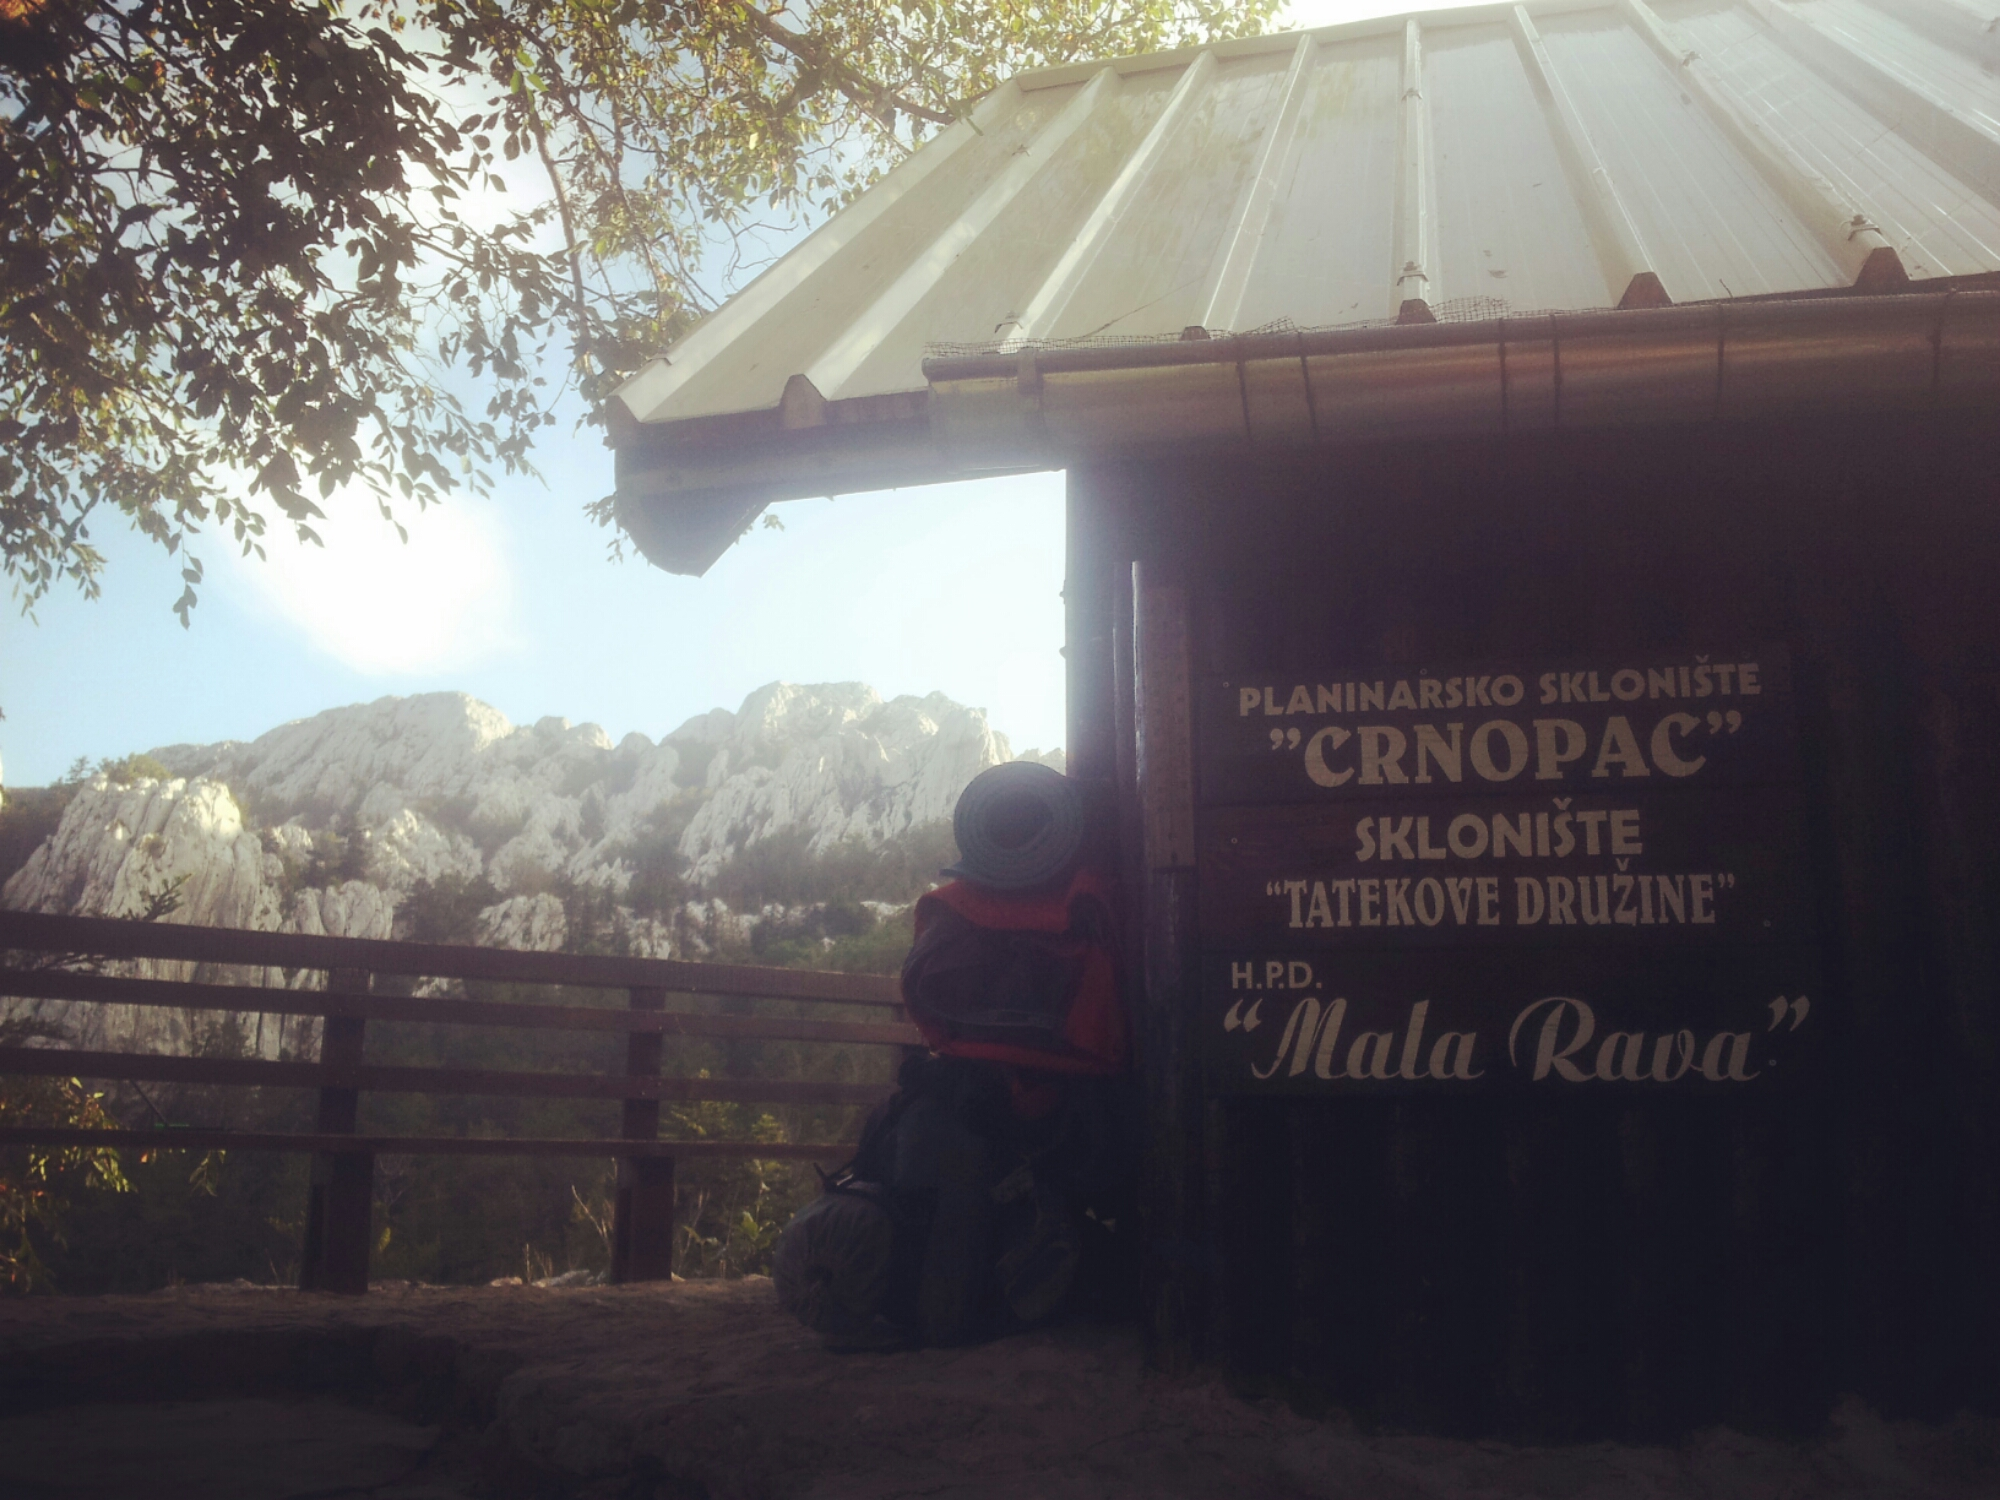 planinarsko-sklonište-crnopac-velebit-via-dinarica-croatia